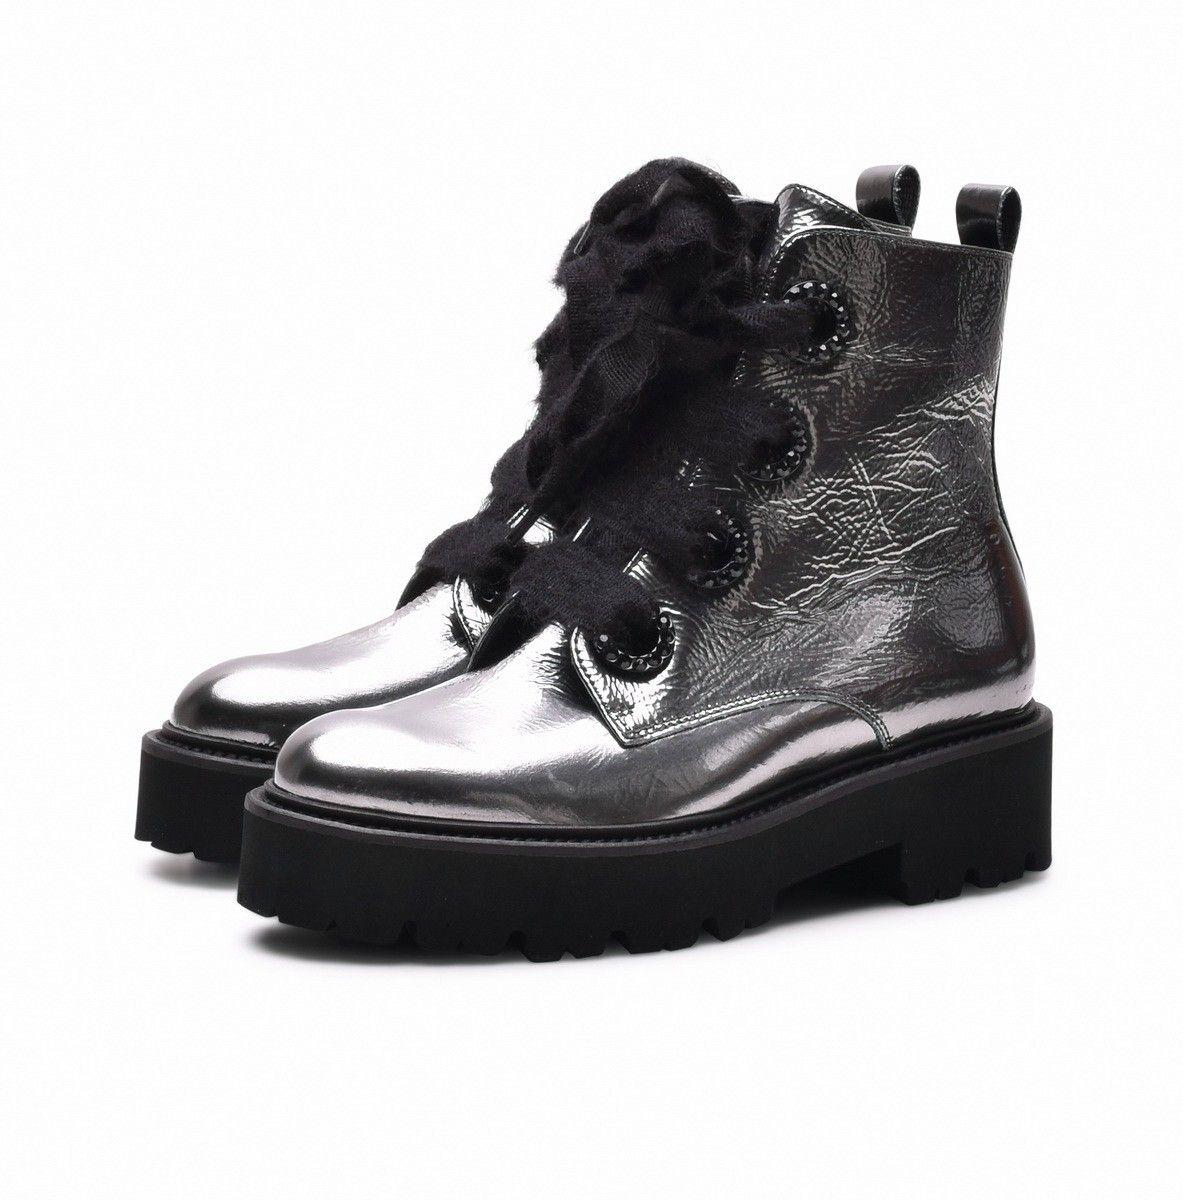 KENNEL & SCHMENGER - Damen Boot Bobby Patent - Antracite Metallic